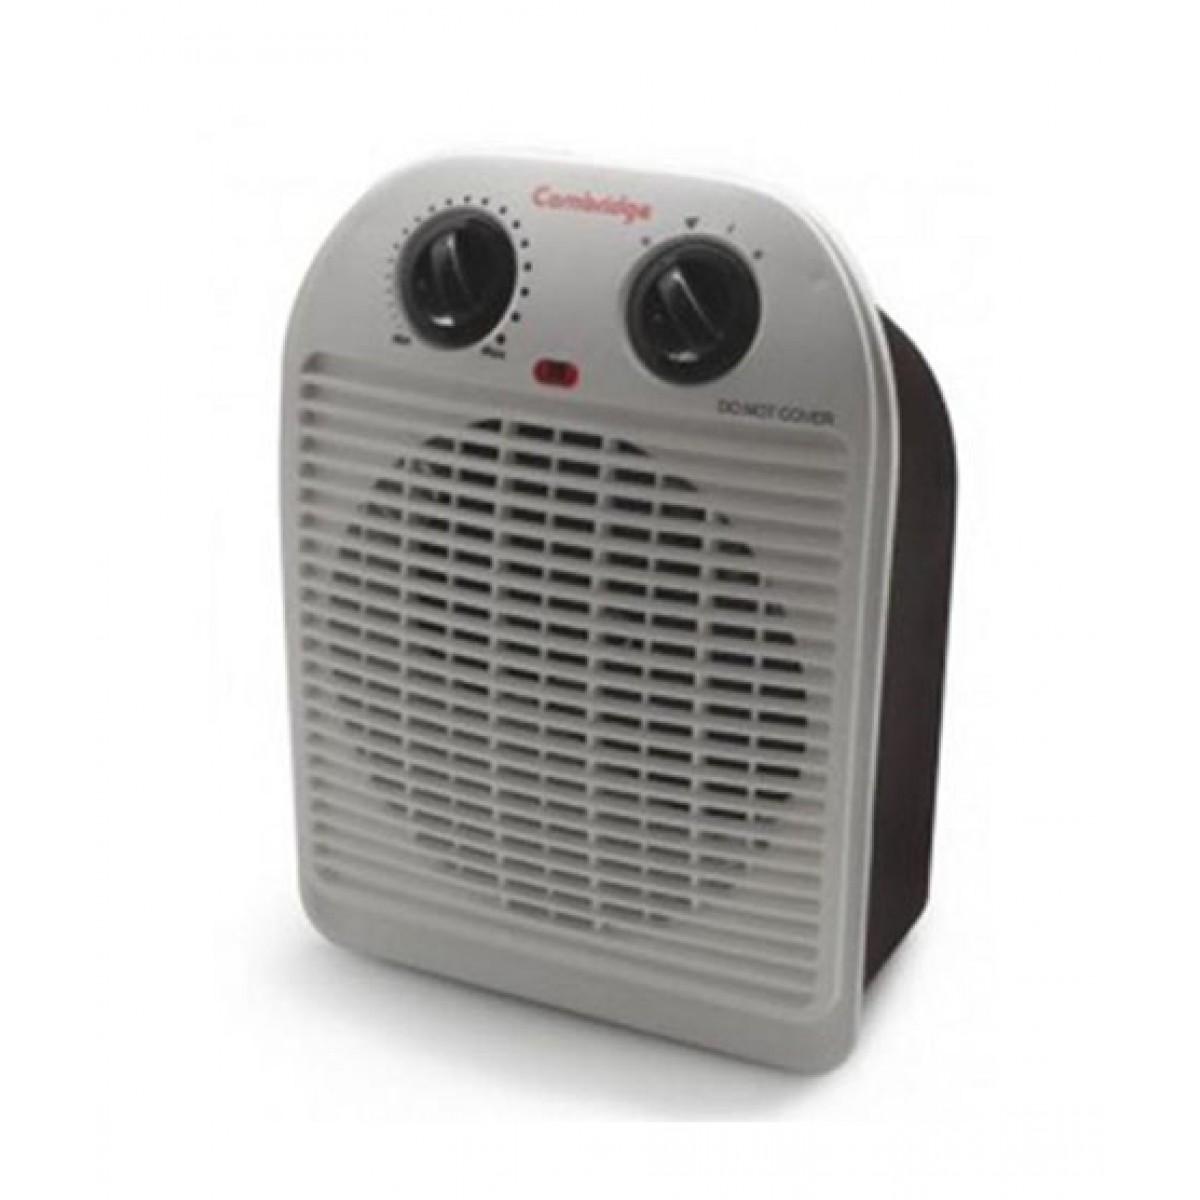 Cambridge Electric Fan Heater Price In Pakistan